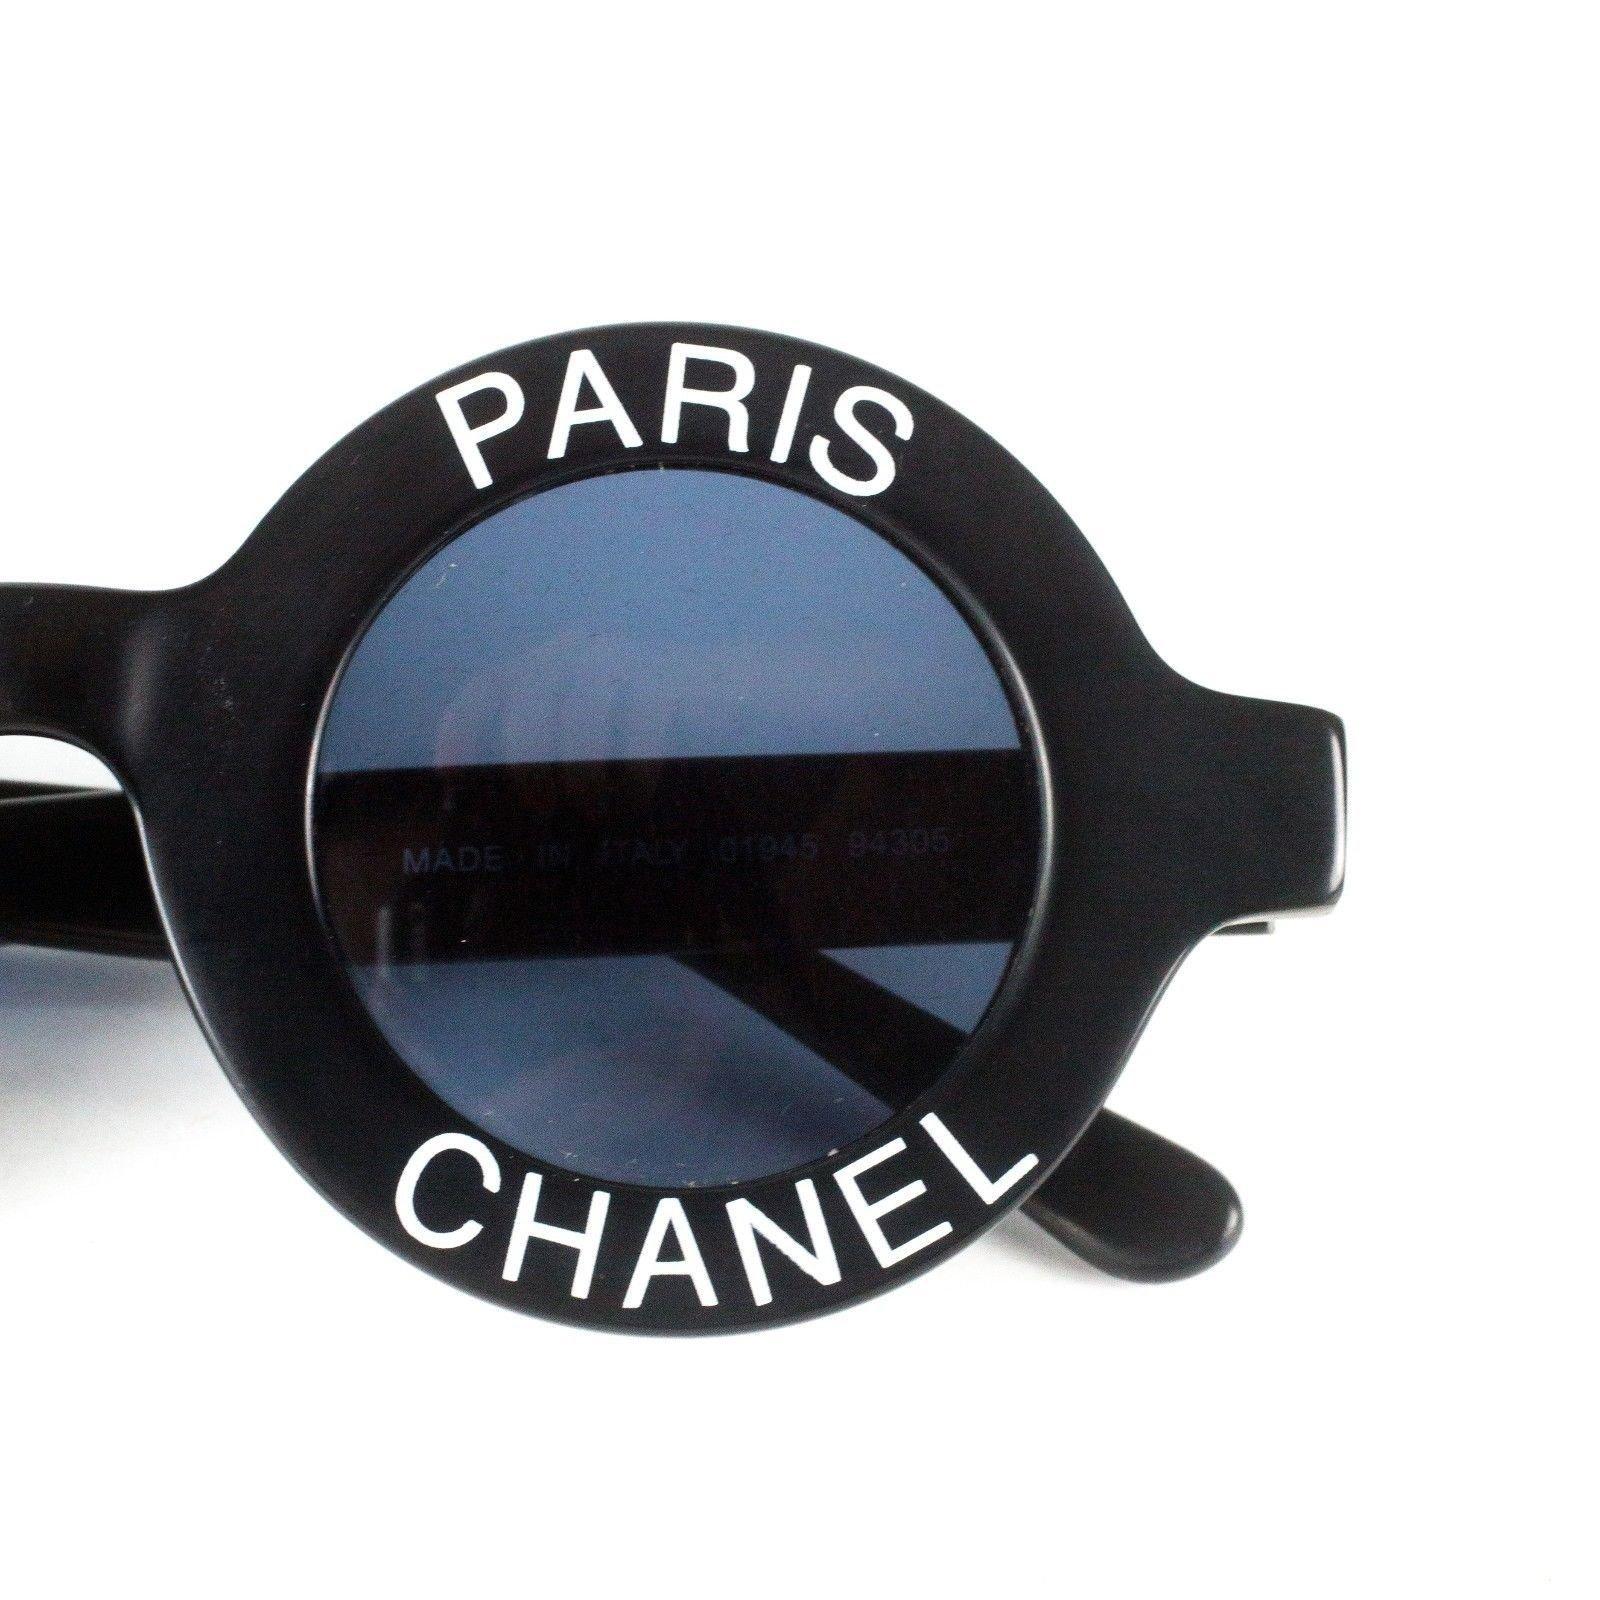 09c2939265 Chanel Chanel -Vintage Round Logo Sunglasses Sunglasses Other Other  ref.37099 - Joli Closet